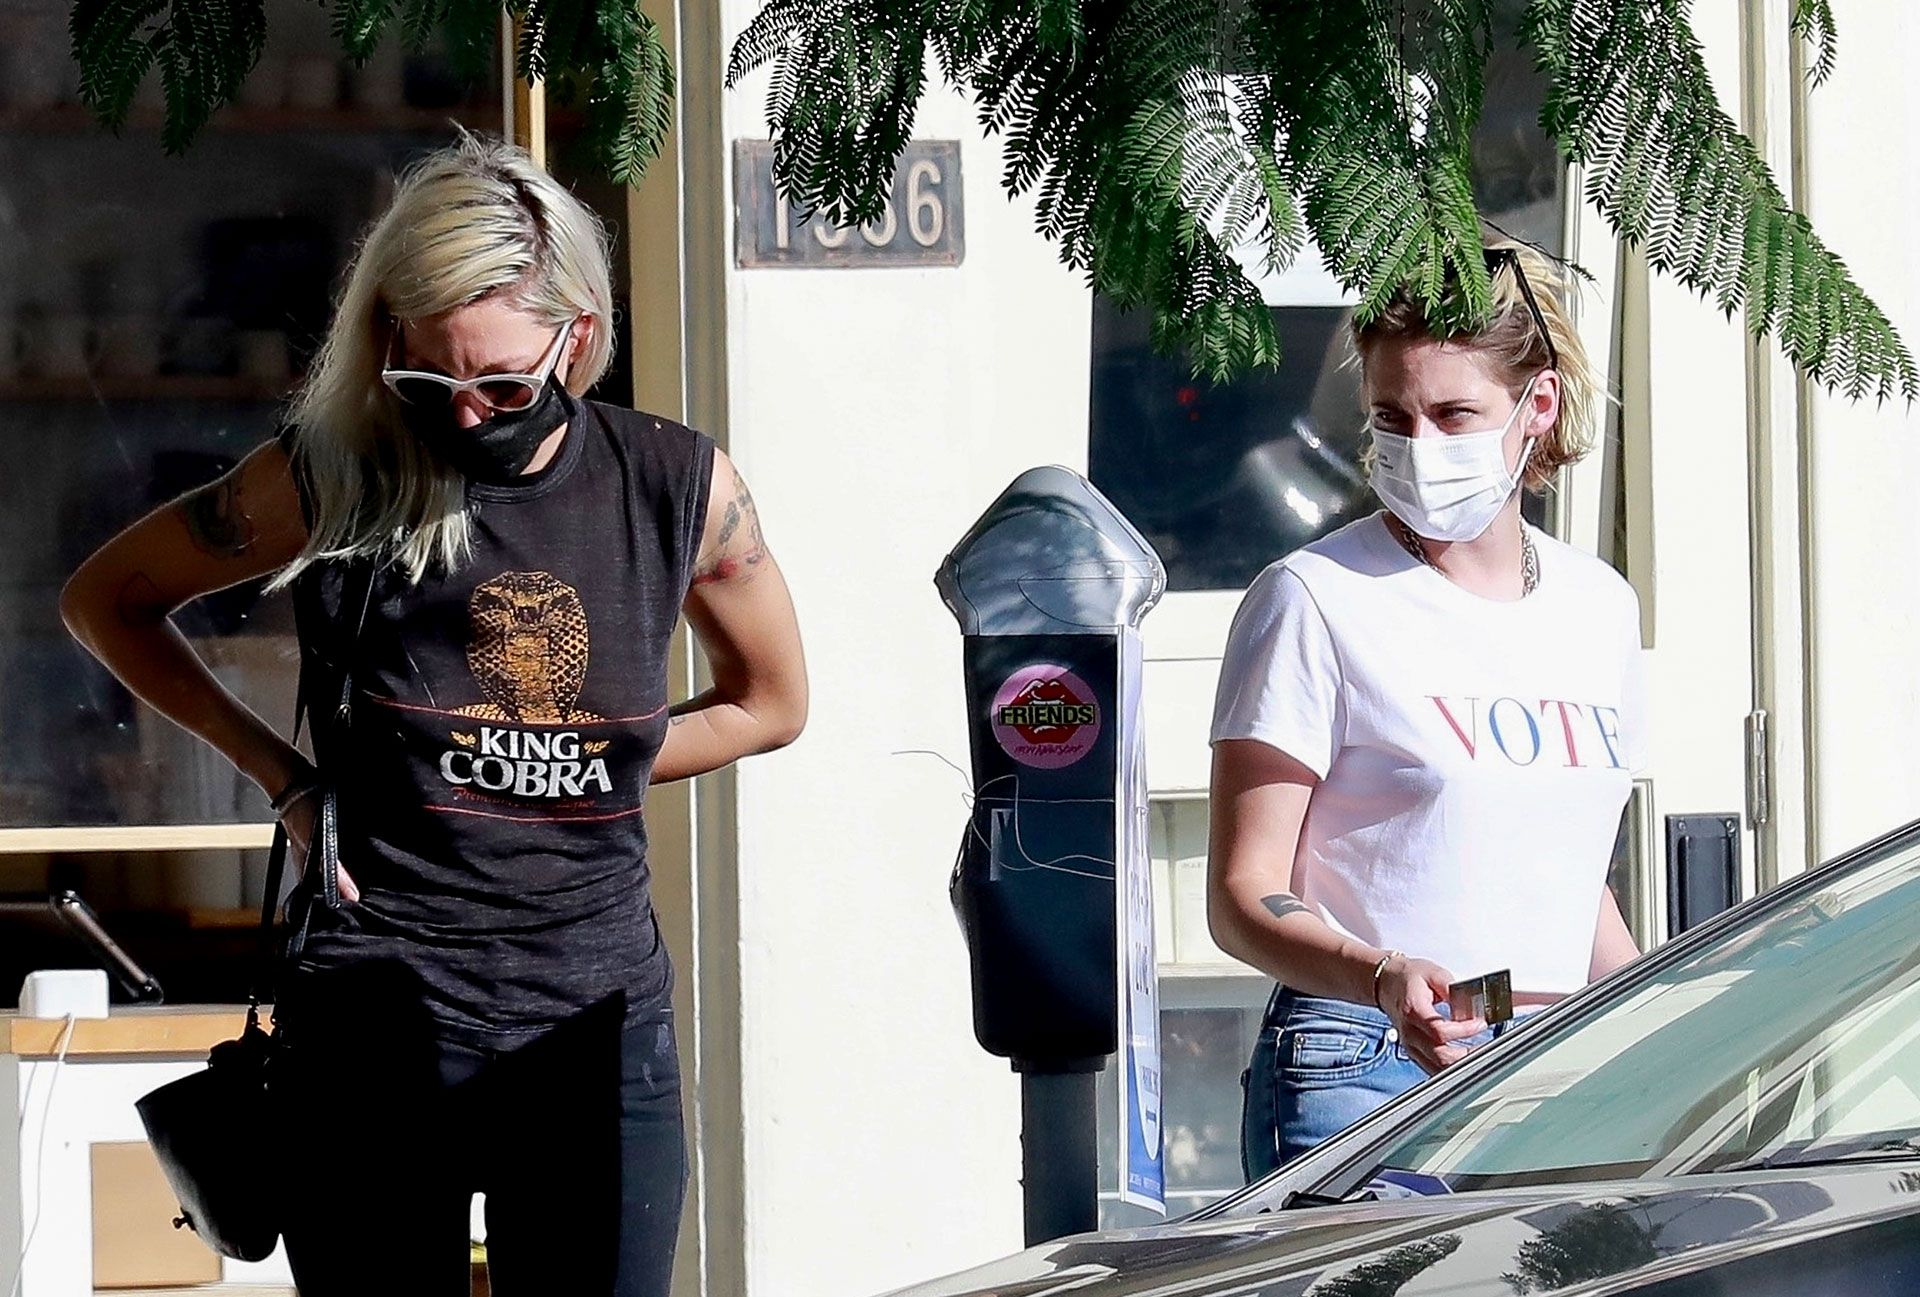 Celebrities-en-un-clic-Kristen-Stewart-24092020